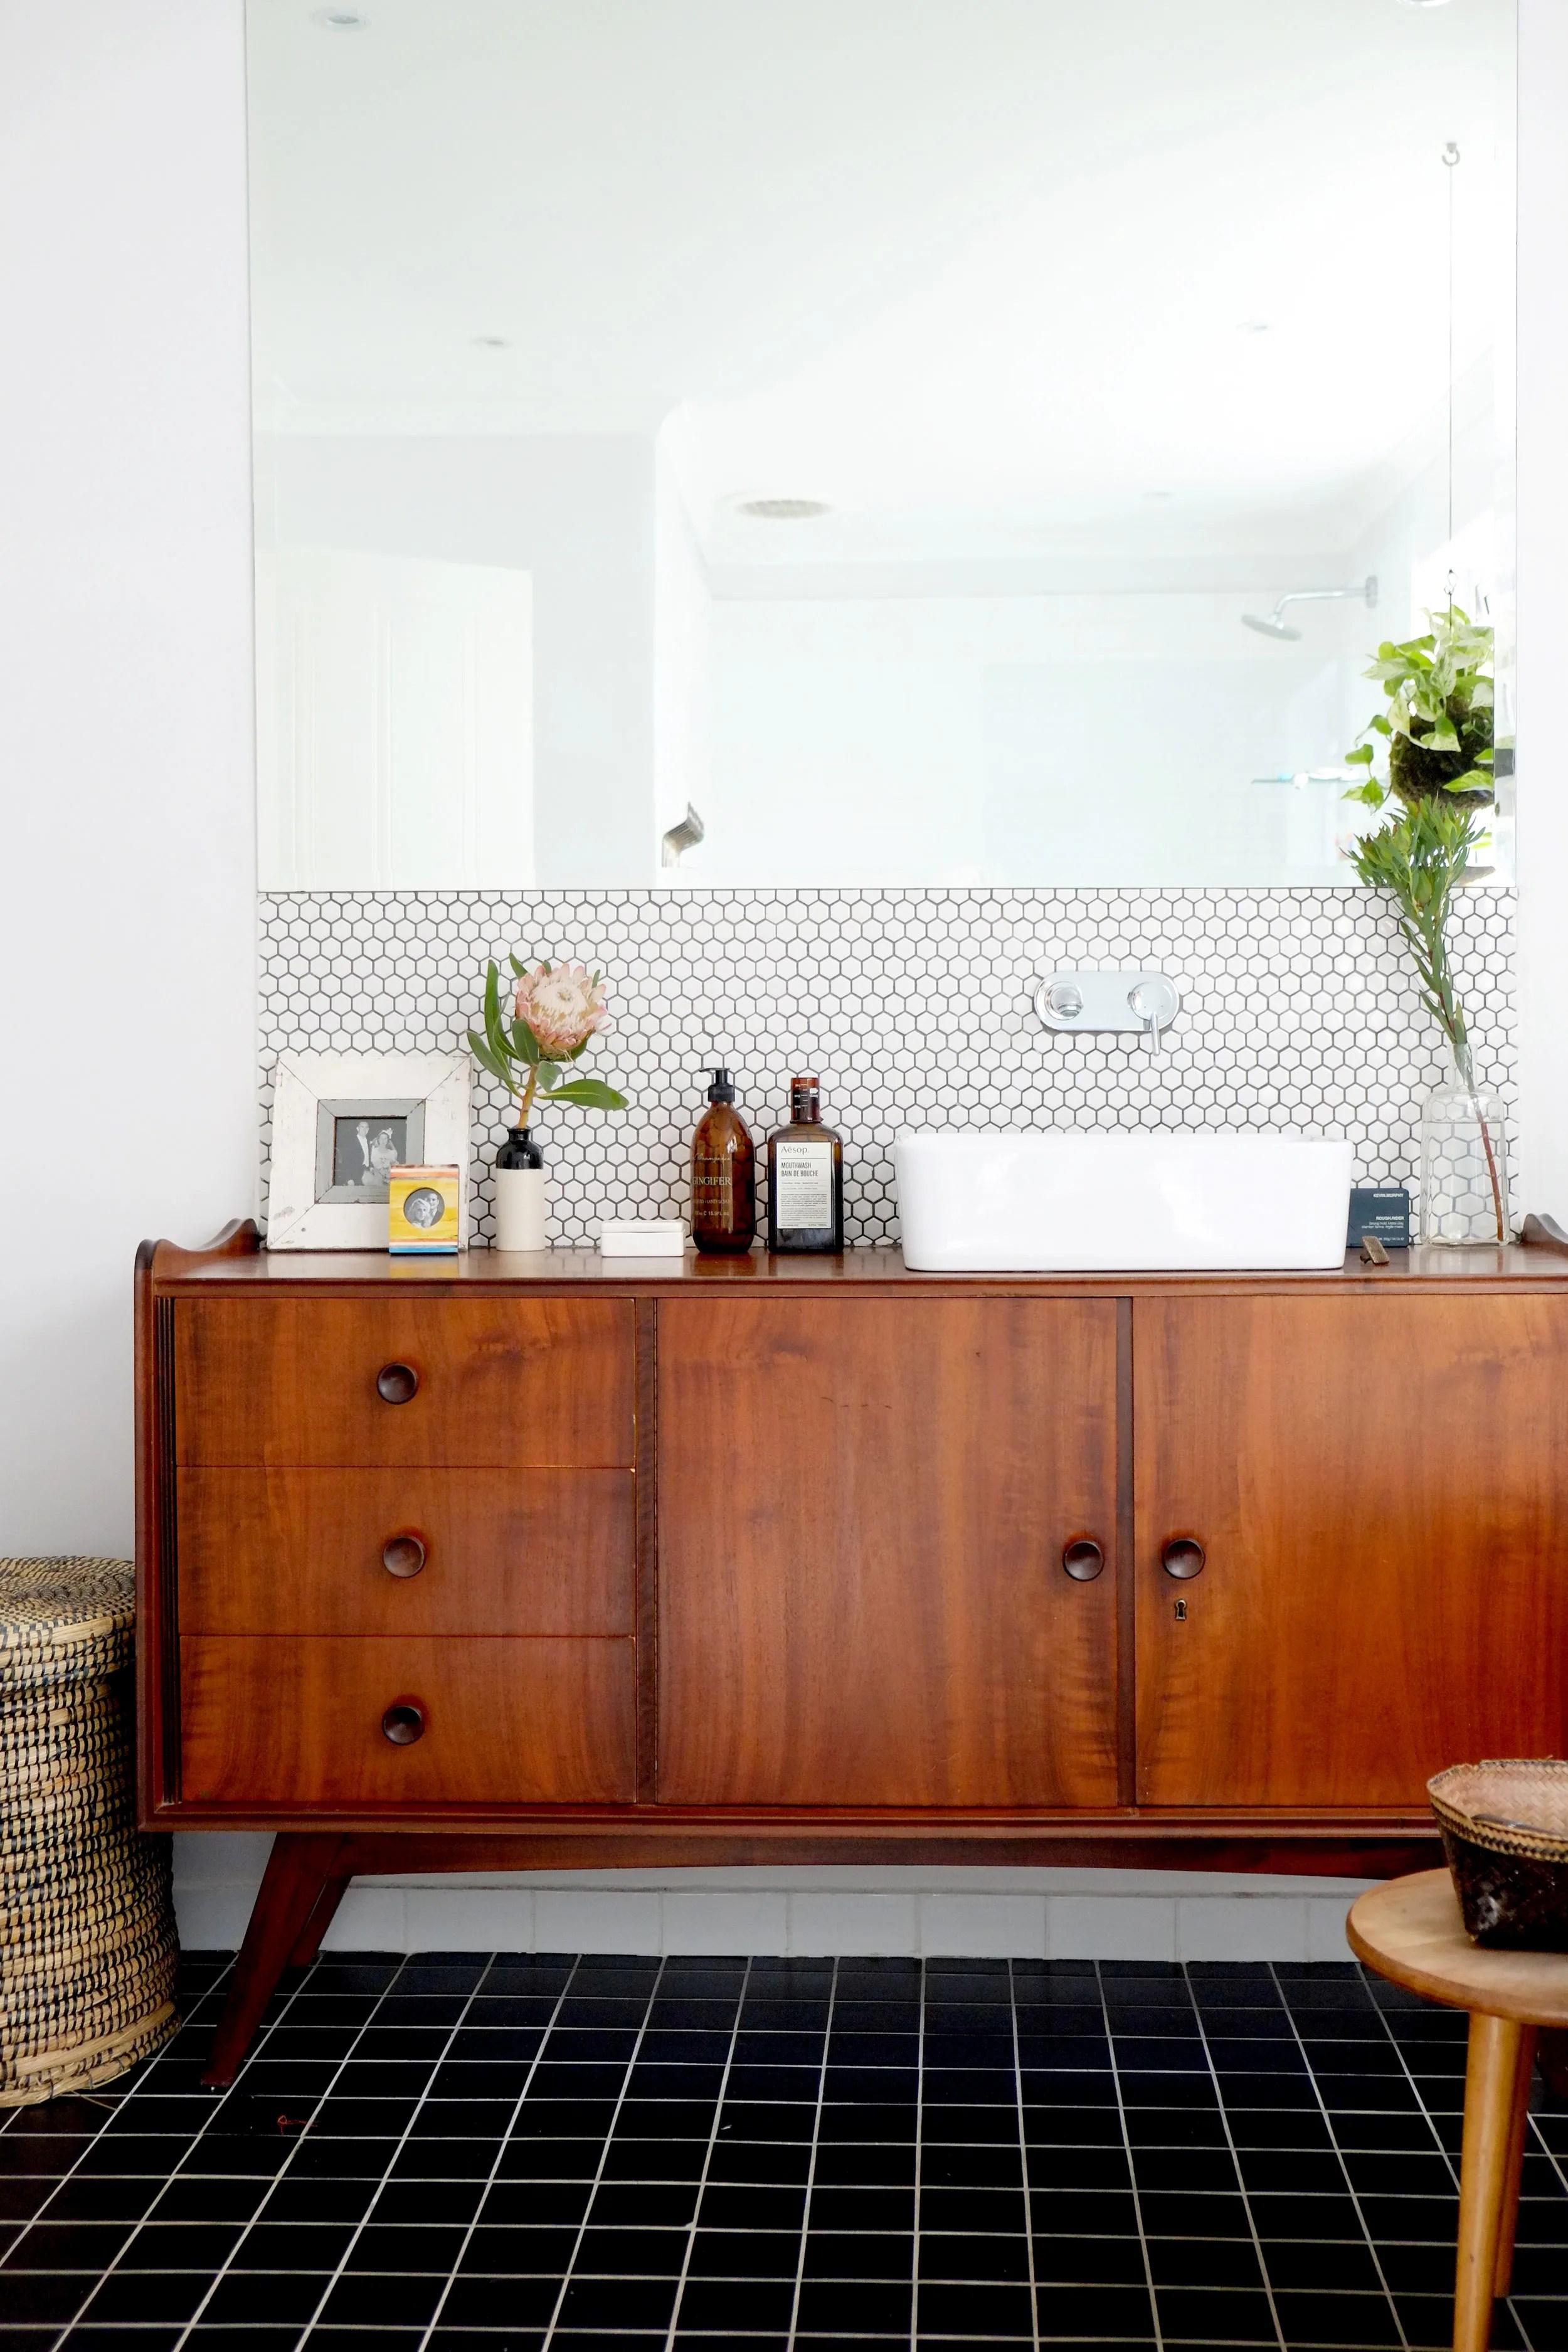 50 Best Bathroom Design Ideas | Apartment Therapy on Apartment Bathroom Ideas  id=38134